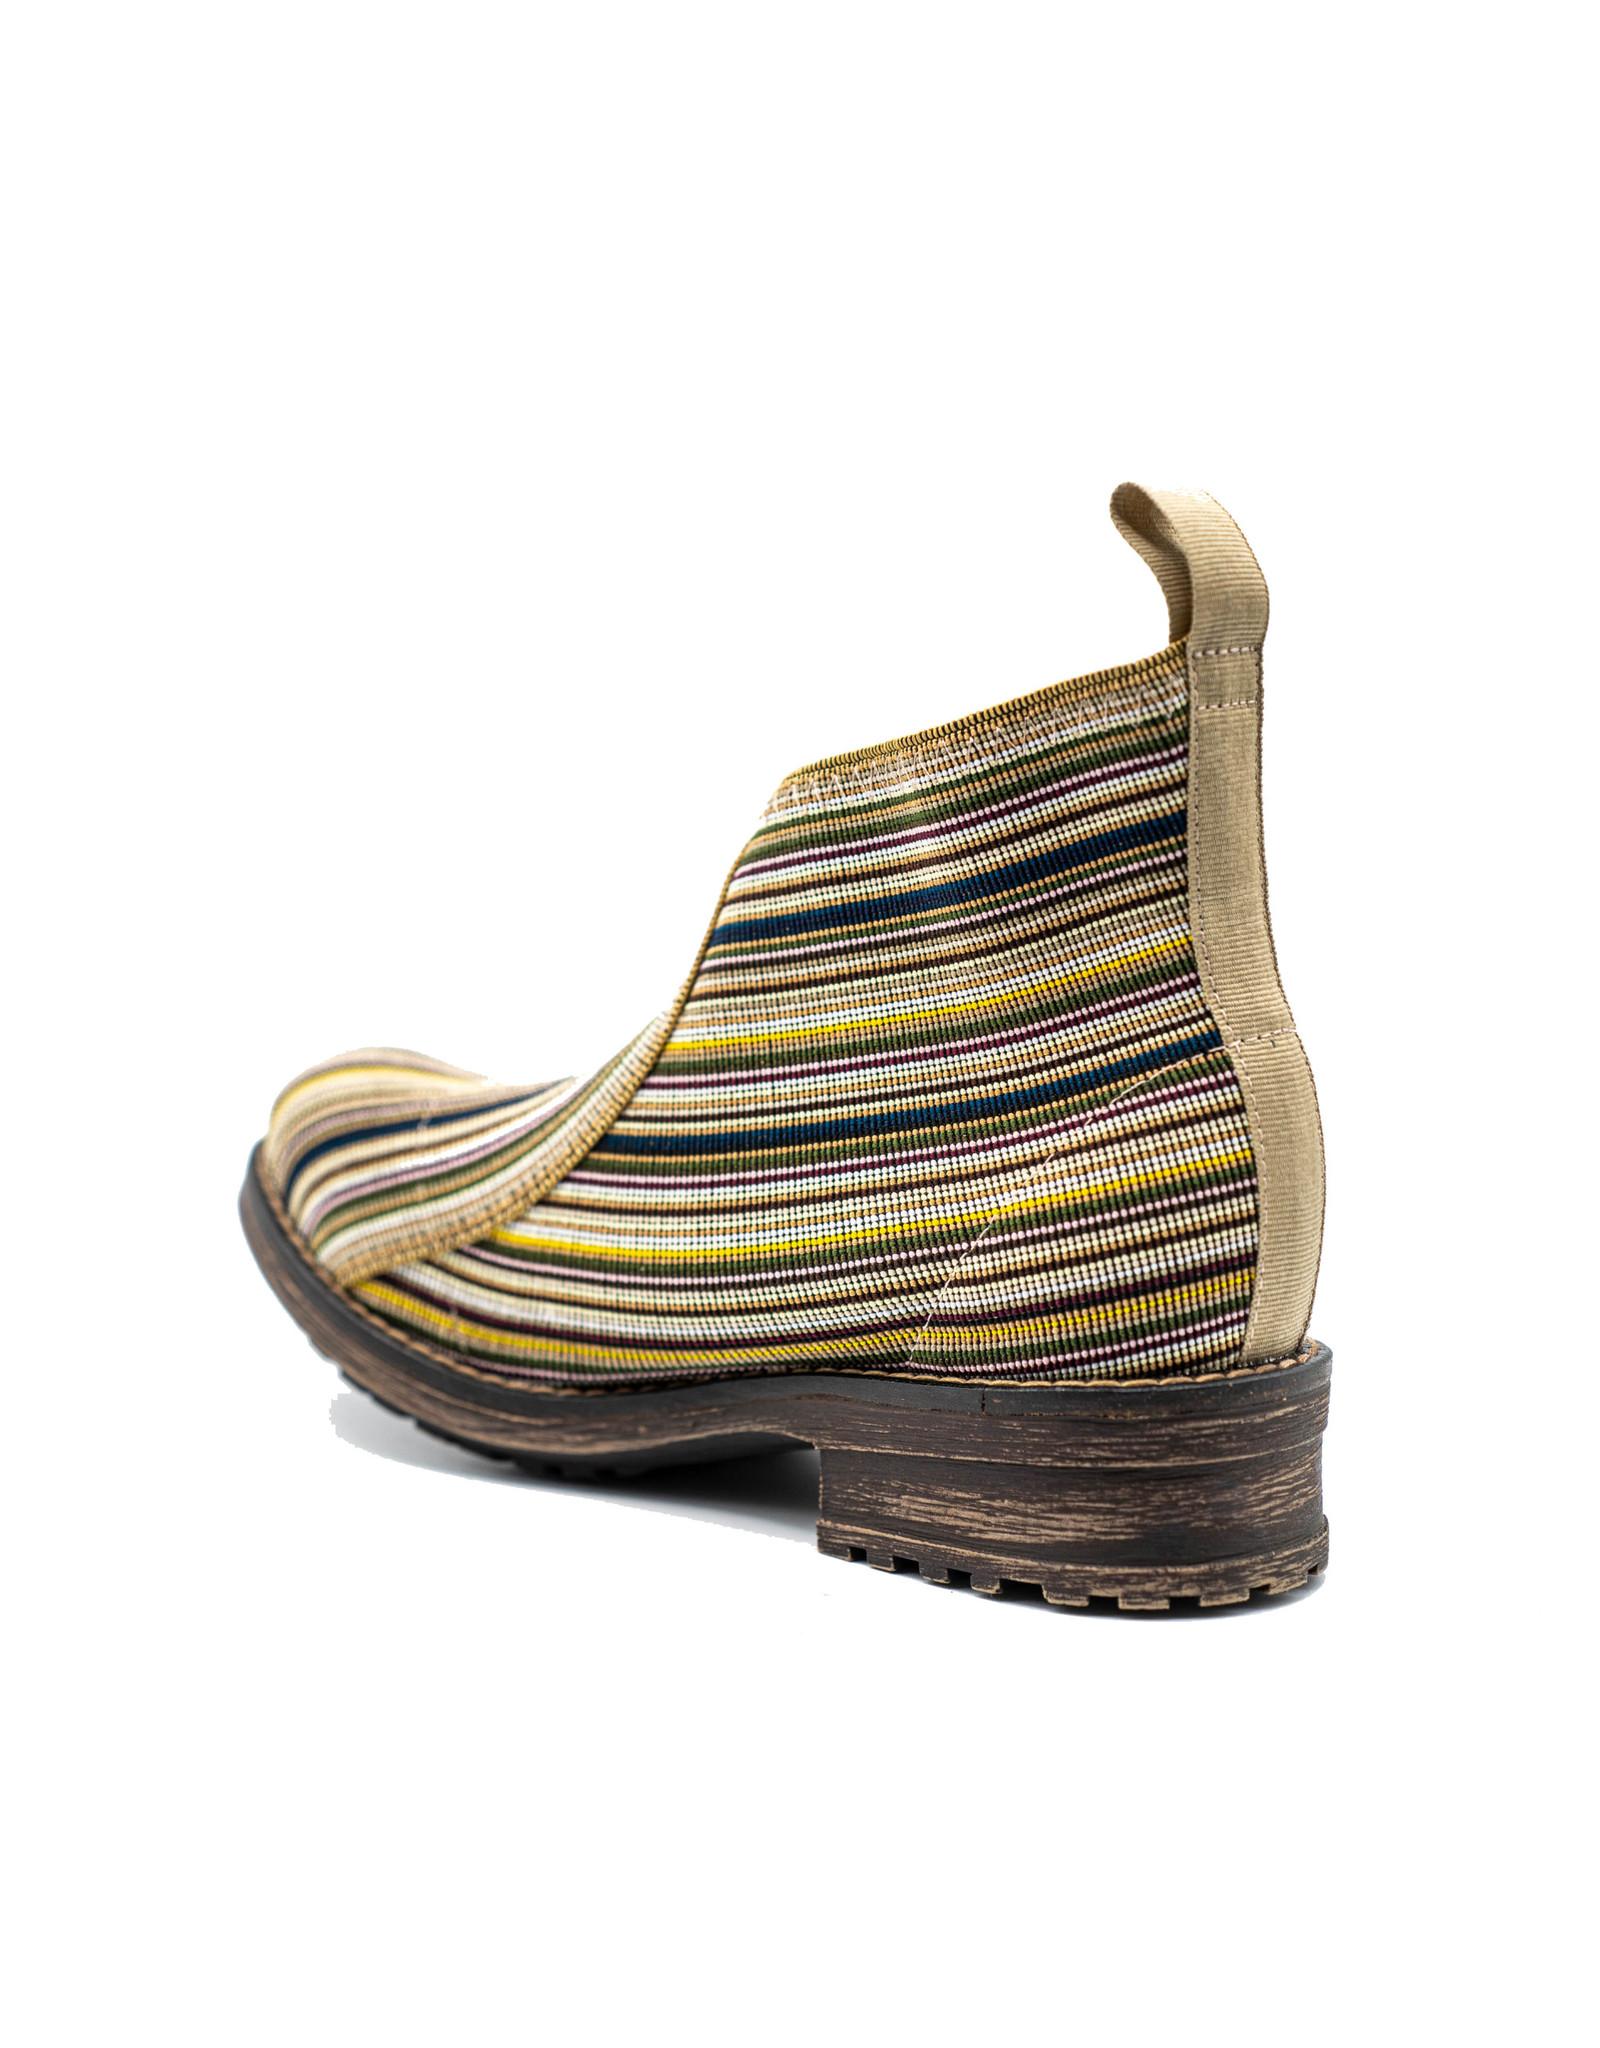 BARCELONA SHOE COMPANY RAMBLA Boot